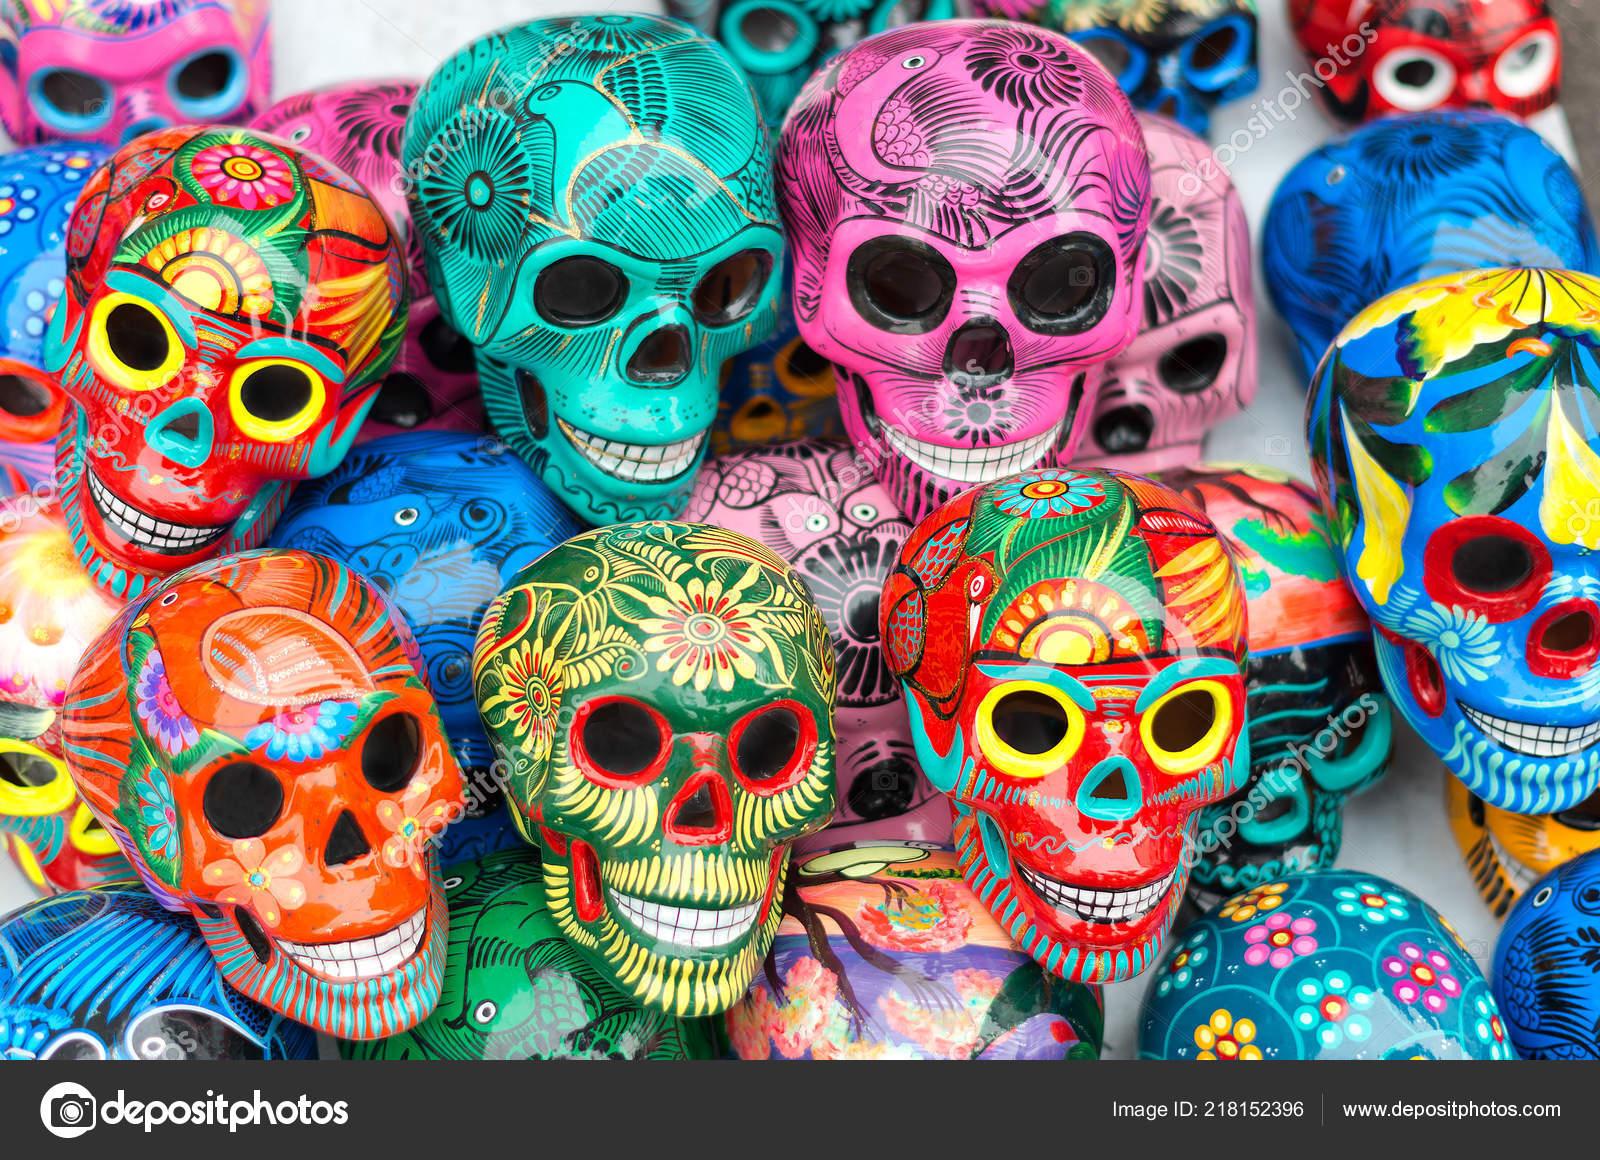 Decorado Coloridos Calaveras Símbolo Muerte Cerámica Mercado Día